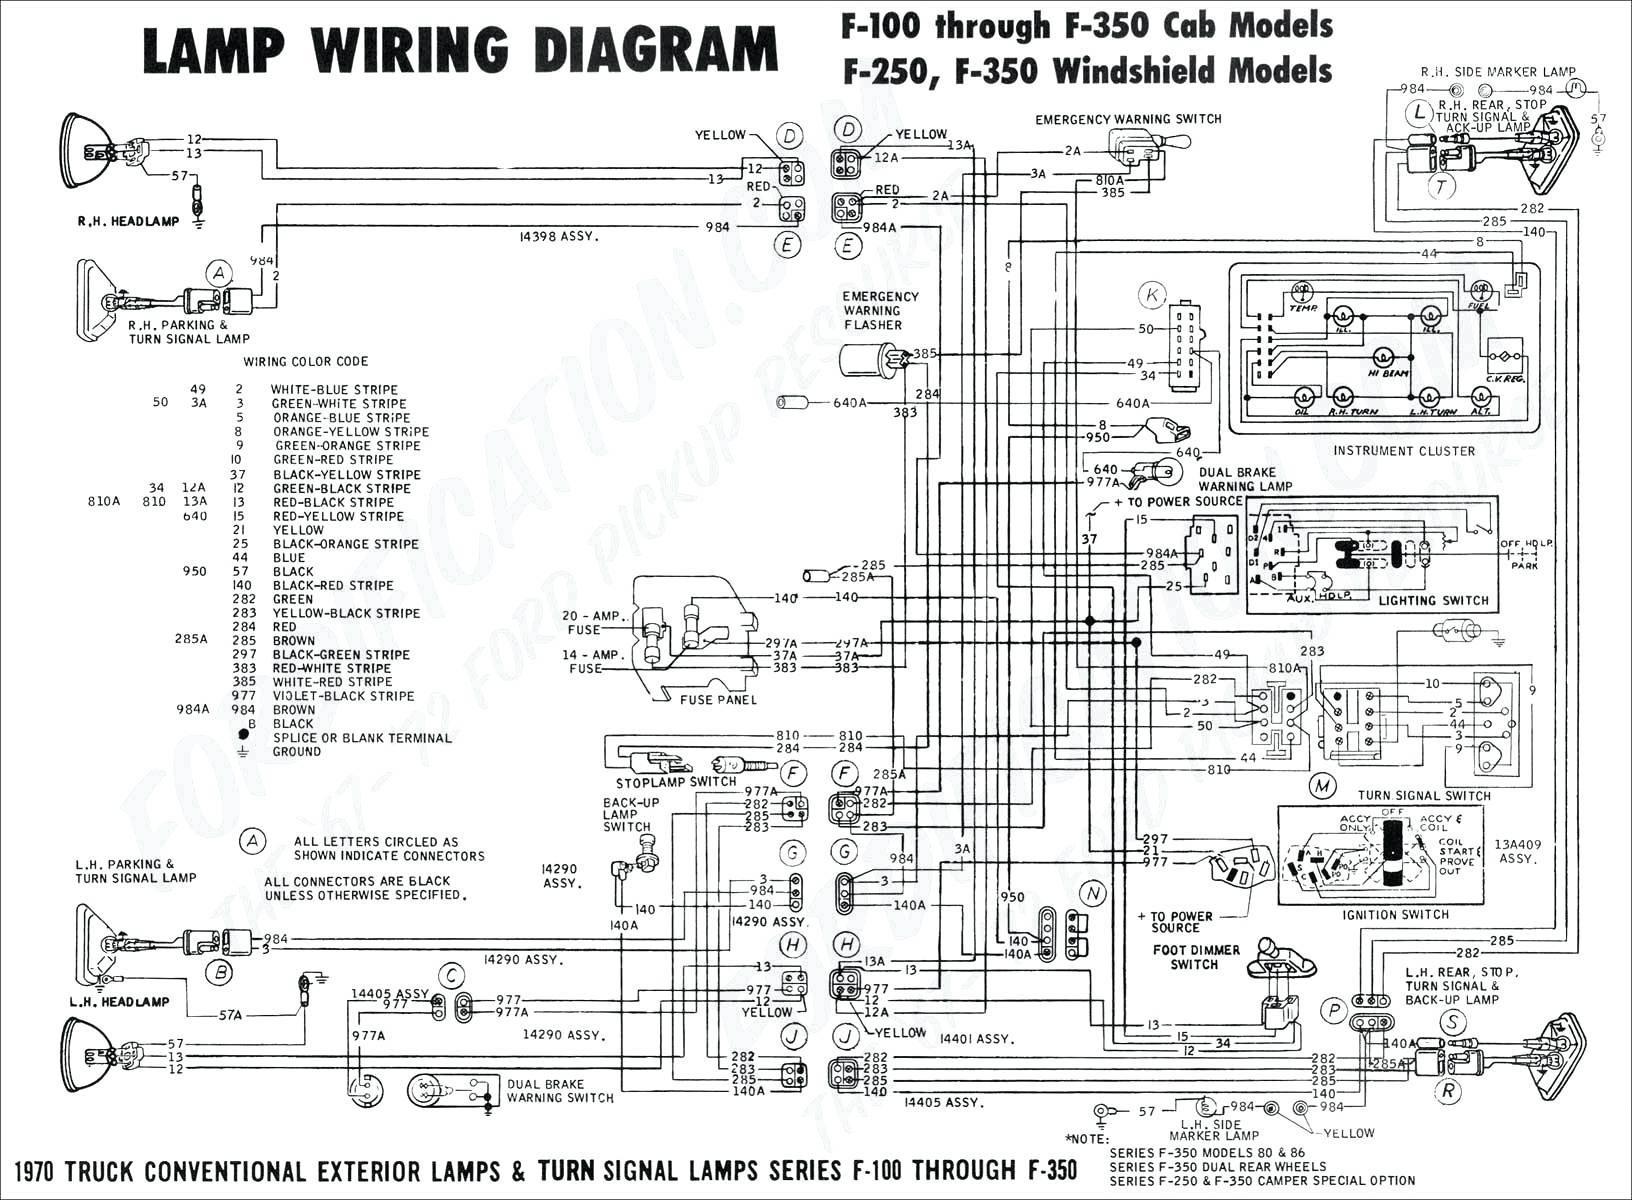 Electric Fuel Pump Relay Wiring Diagram